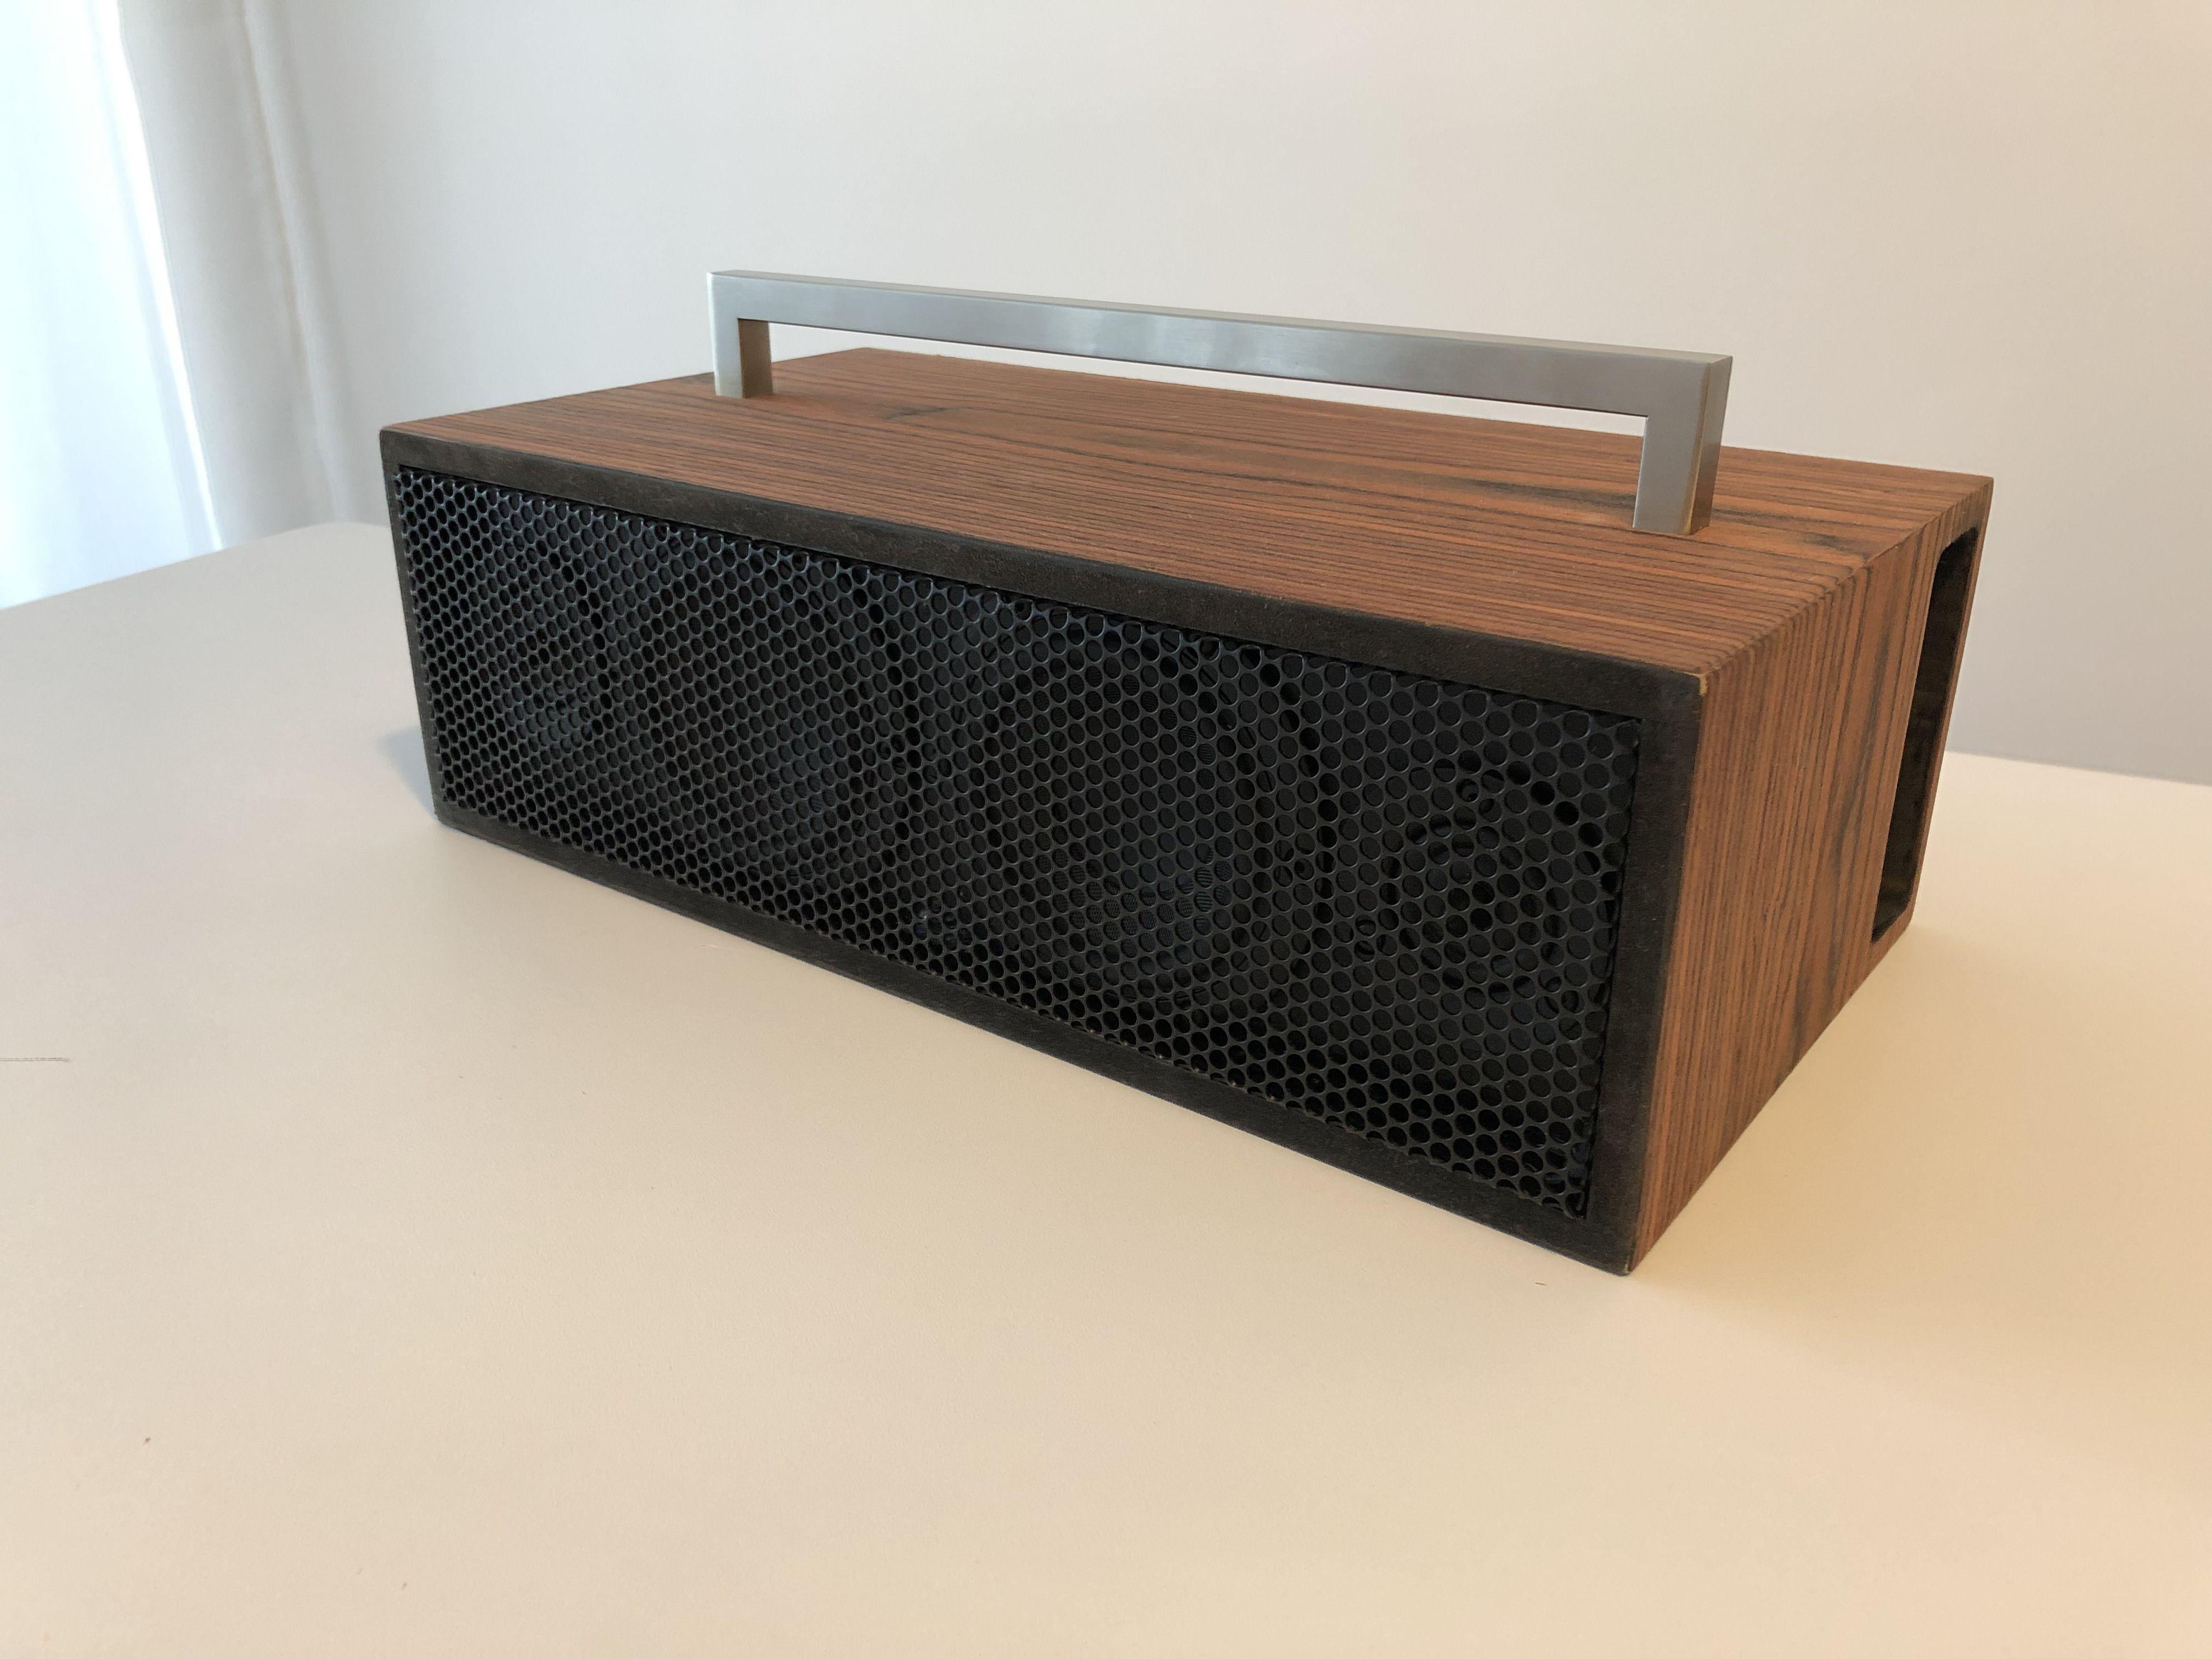 Diy boombox plans 2 x 100 watt 12 hours playtime diy